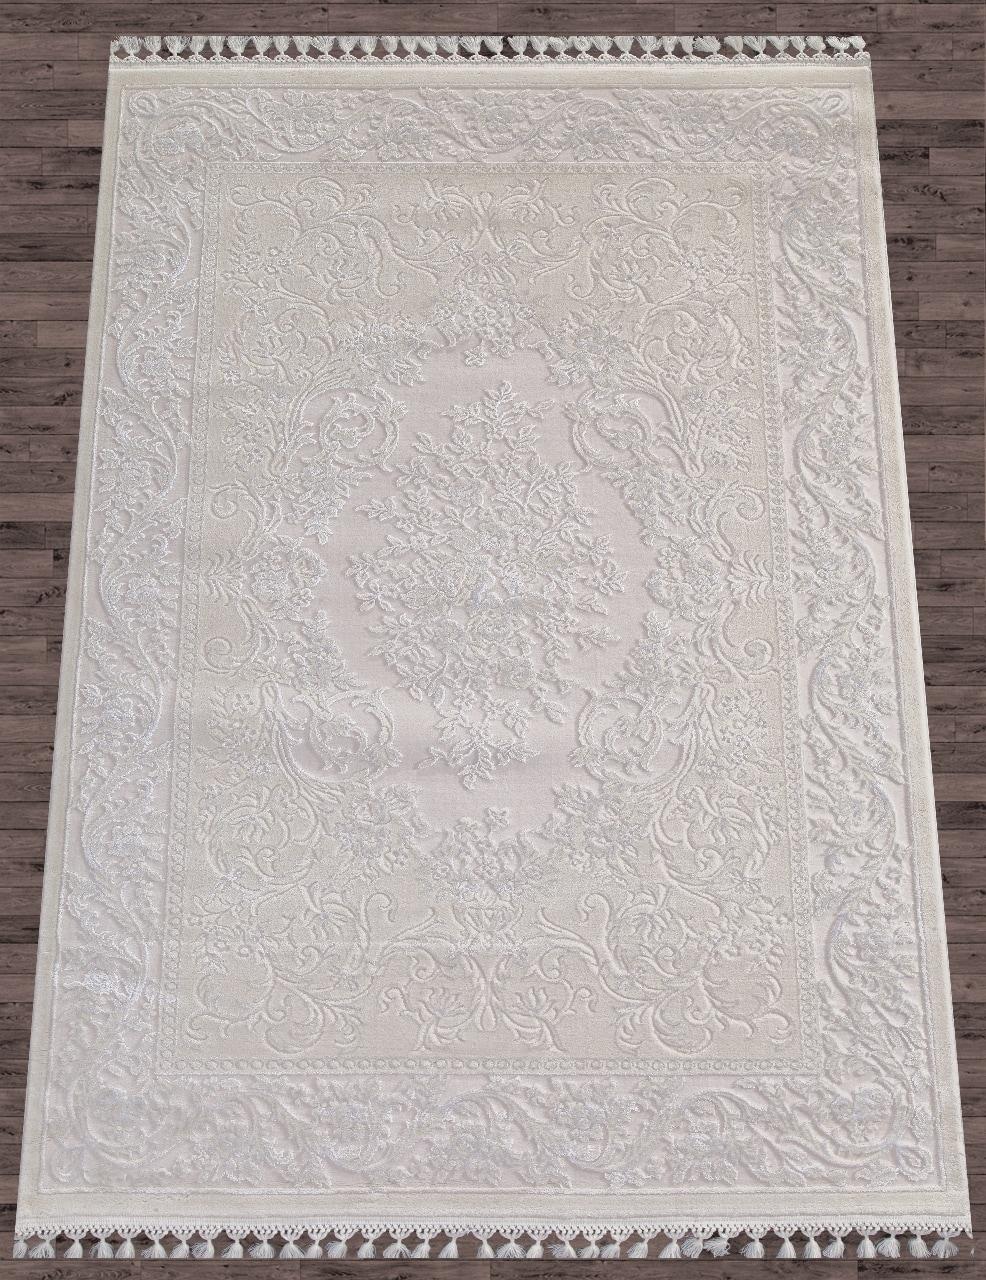 Ковер 8006 - WHITE / WHITE - Прямоугольник - коллекция HUNKAR